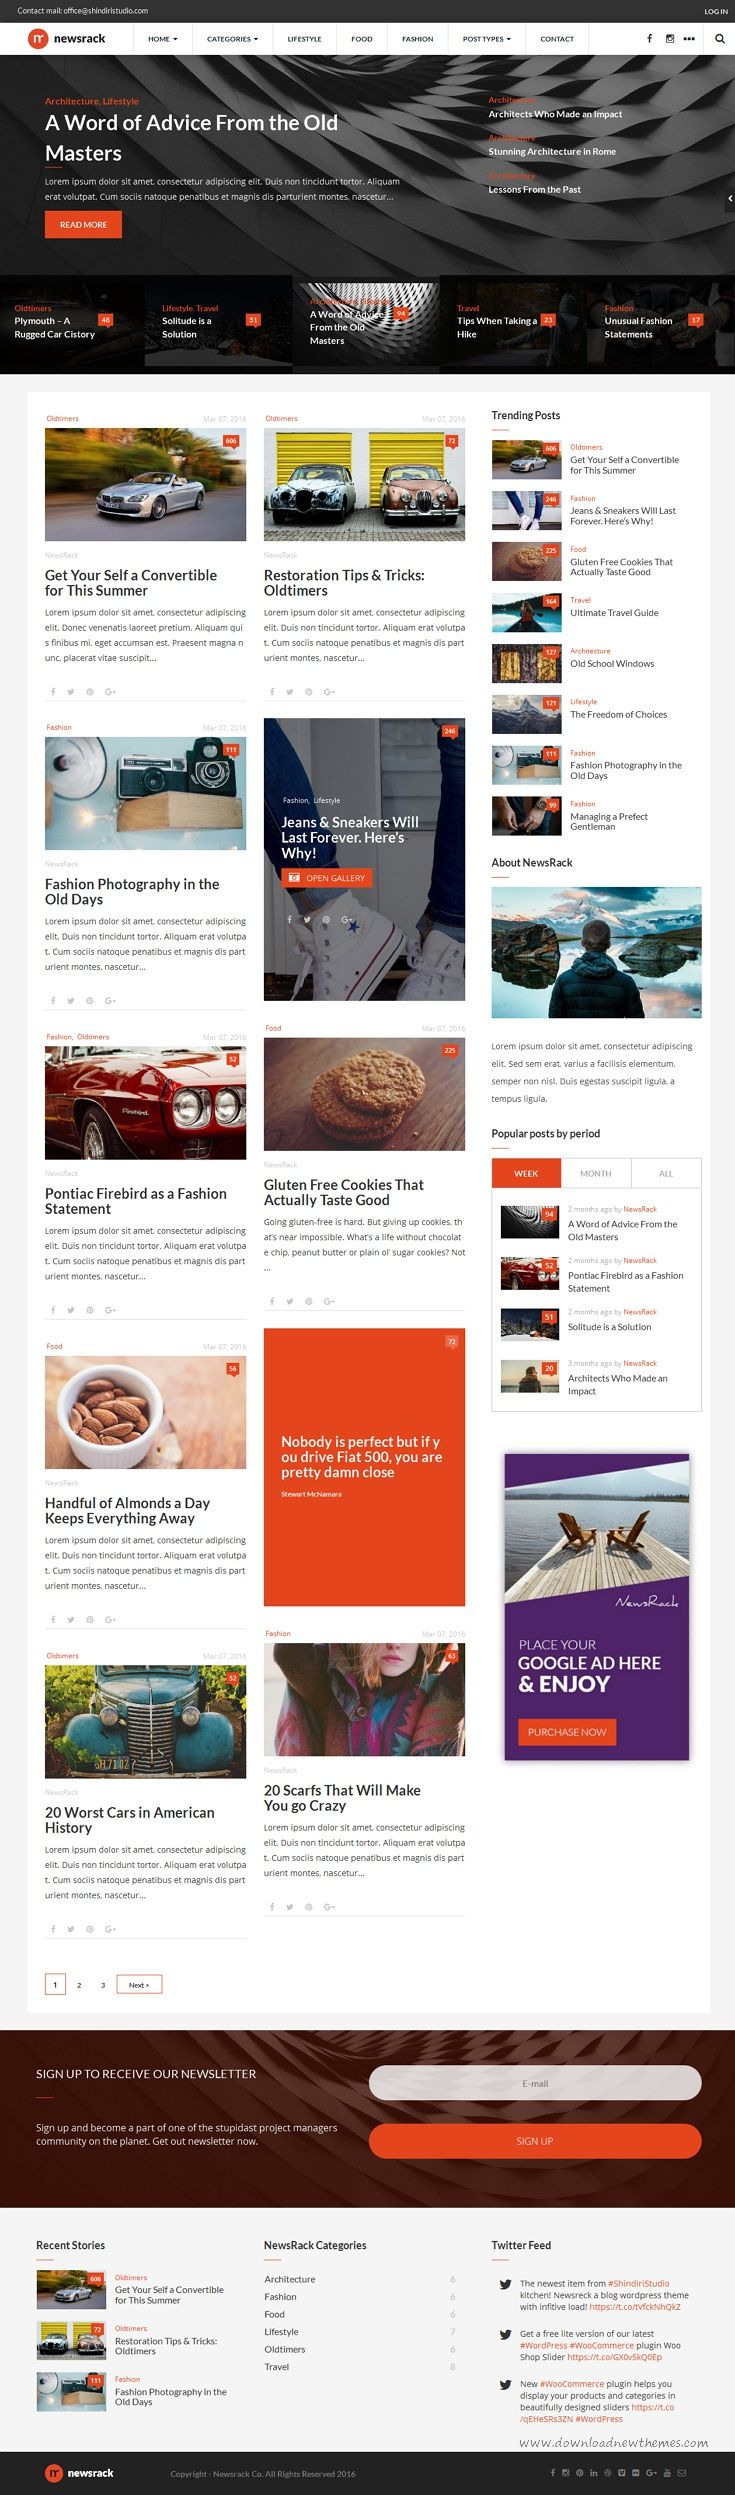 Newsrack Responsive Wordpress Blog Theme With Infinitive Load